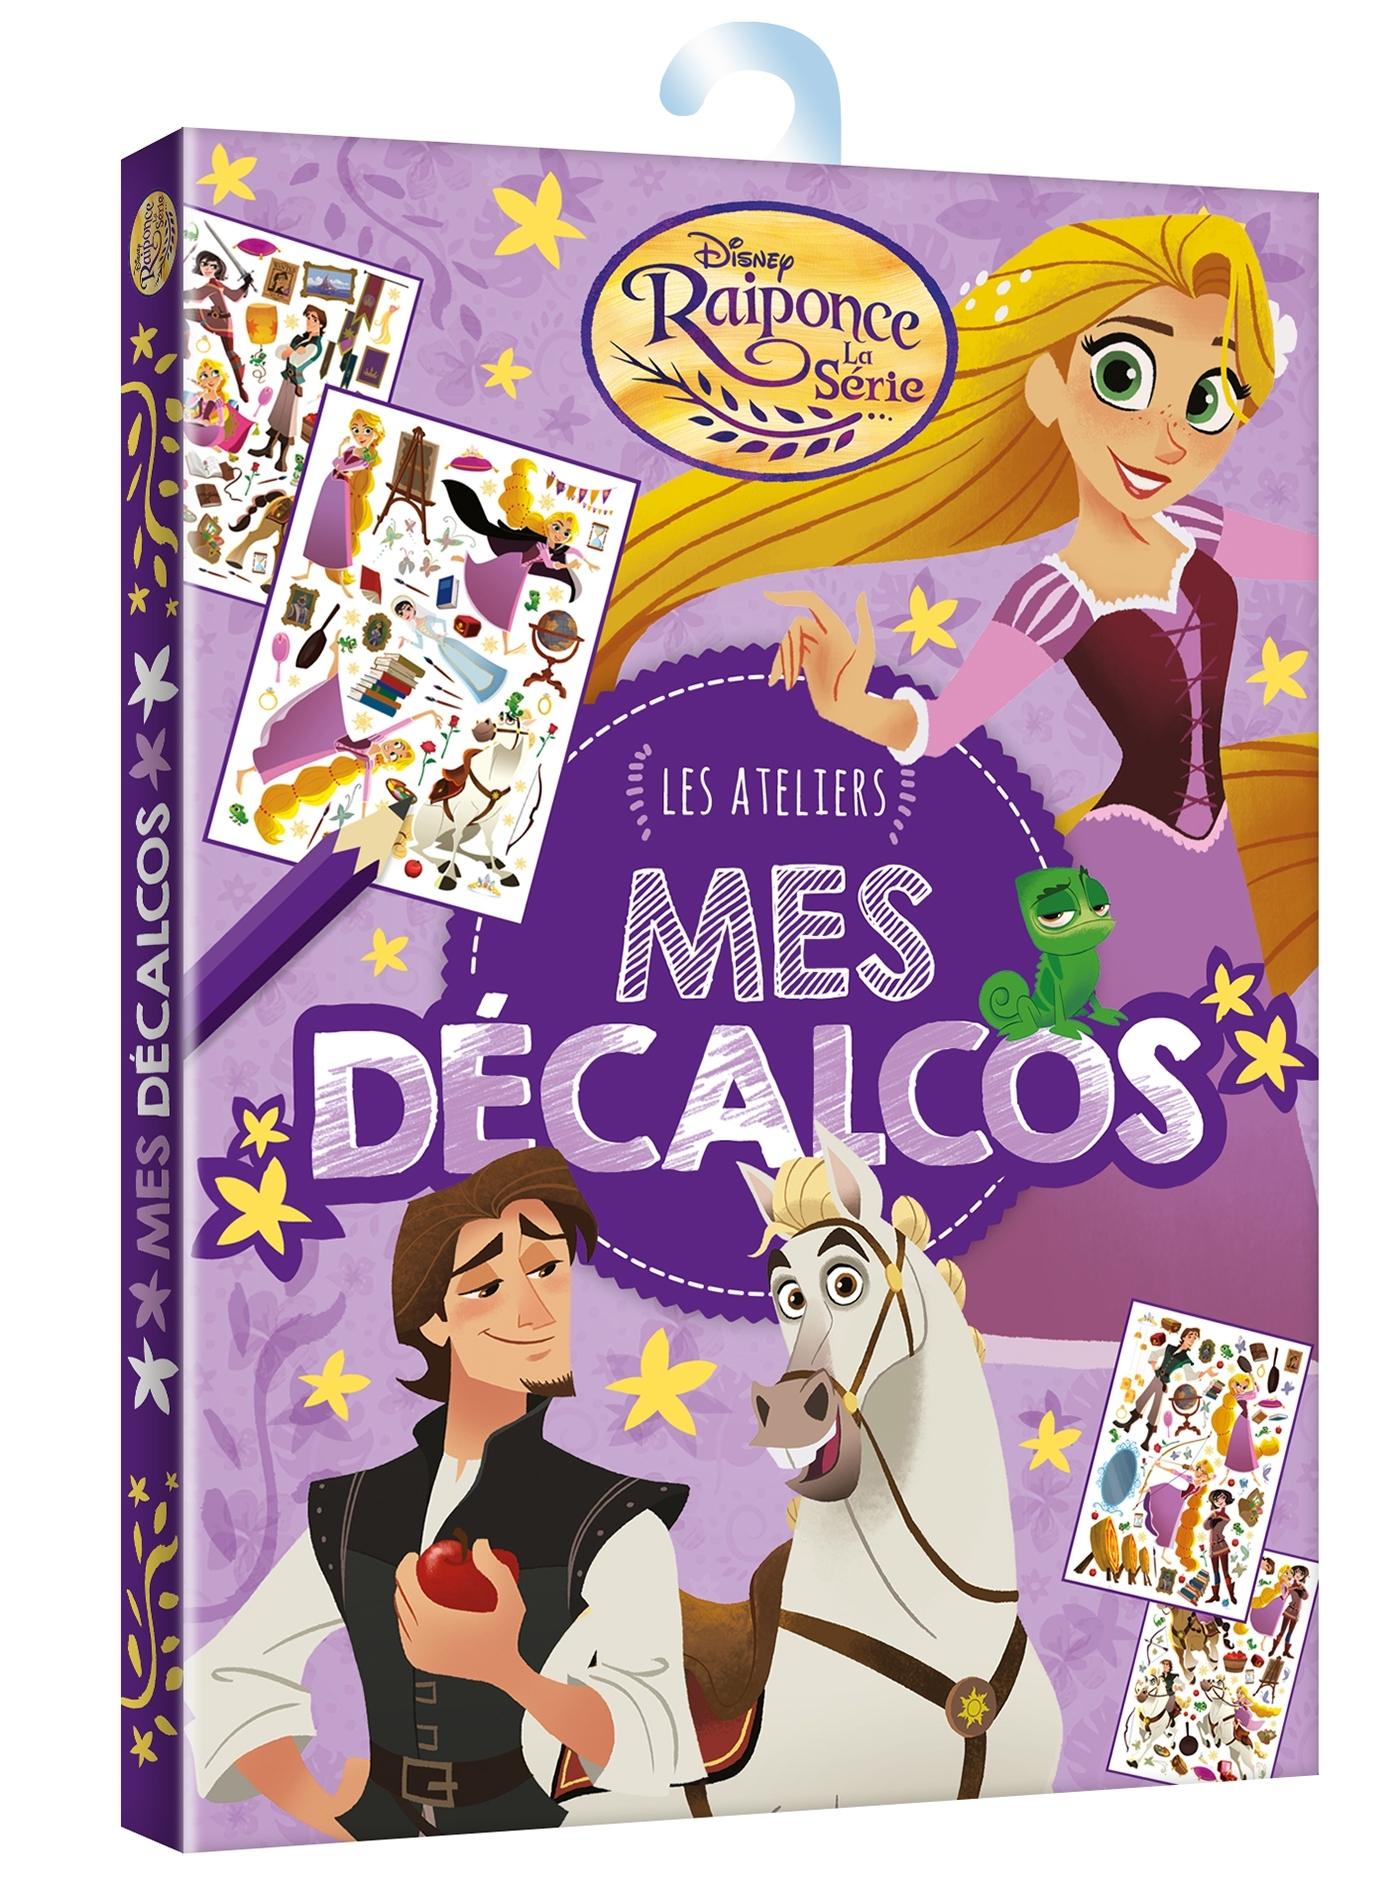 RAIPONCE (SERIE TV) - MA POCHETTE DE DECALCOMANIES